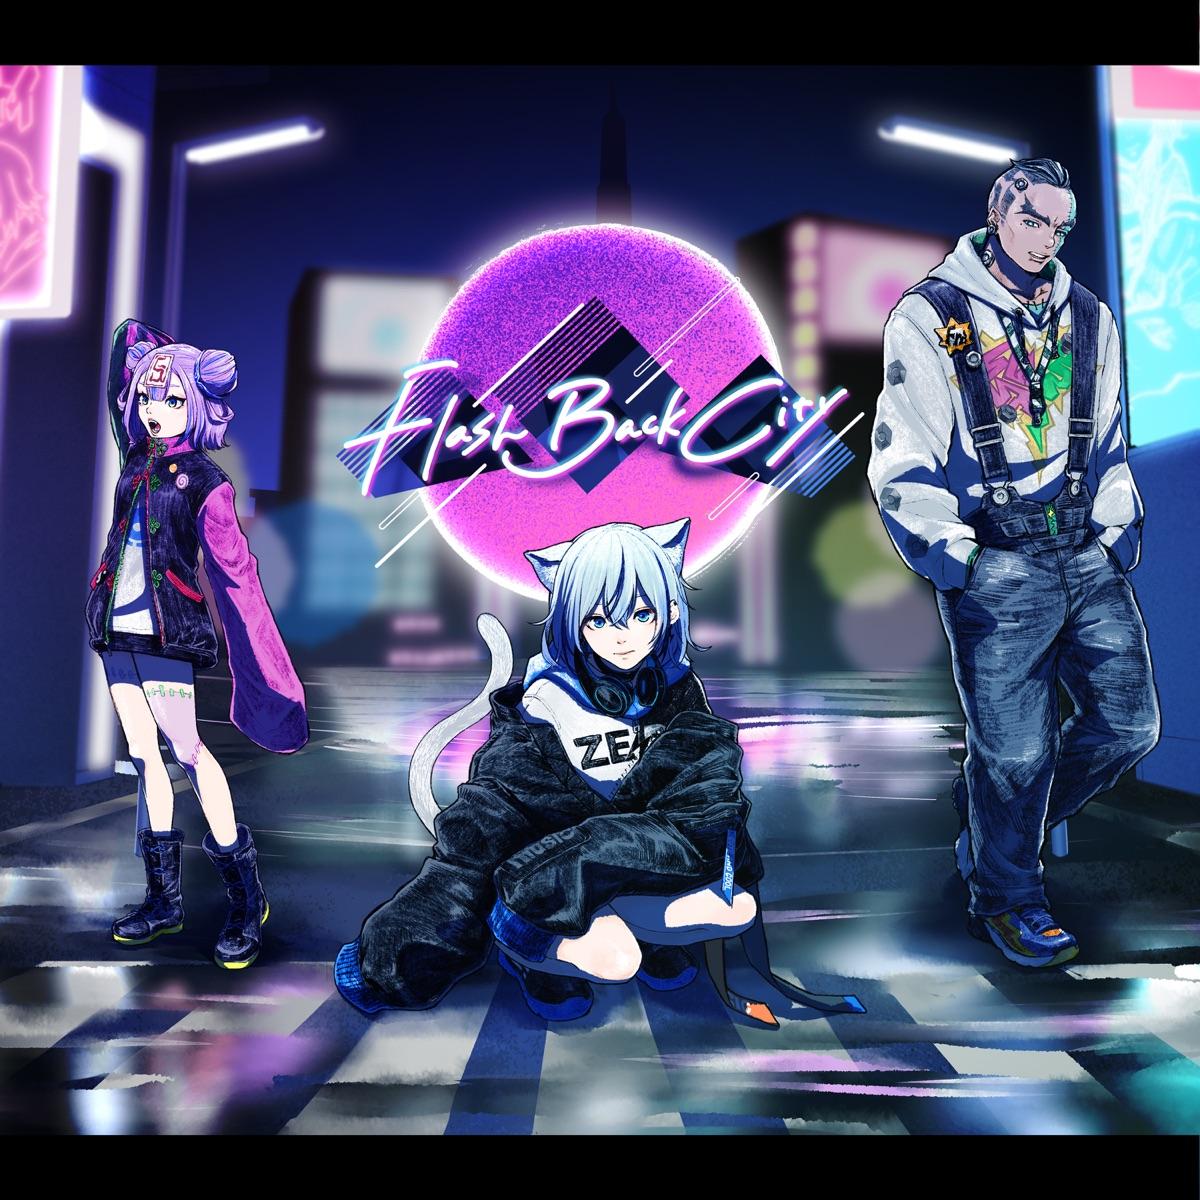 『BOOGEY VOXX - Flash Back City feat. 紡音れい』収録の『Flash Back City』ジャケット